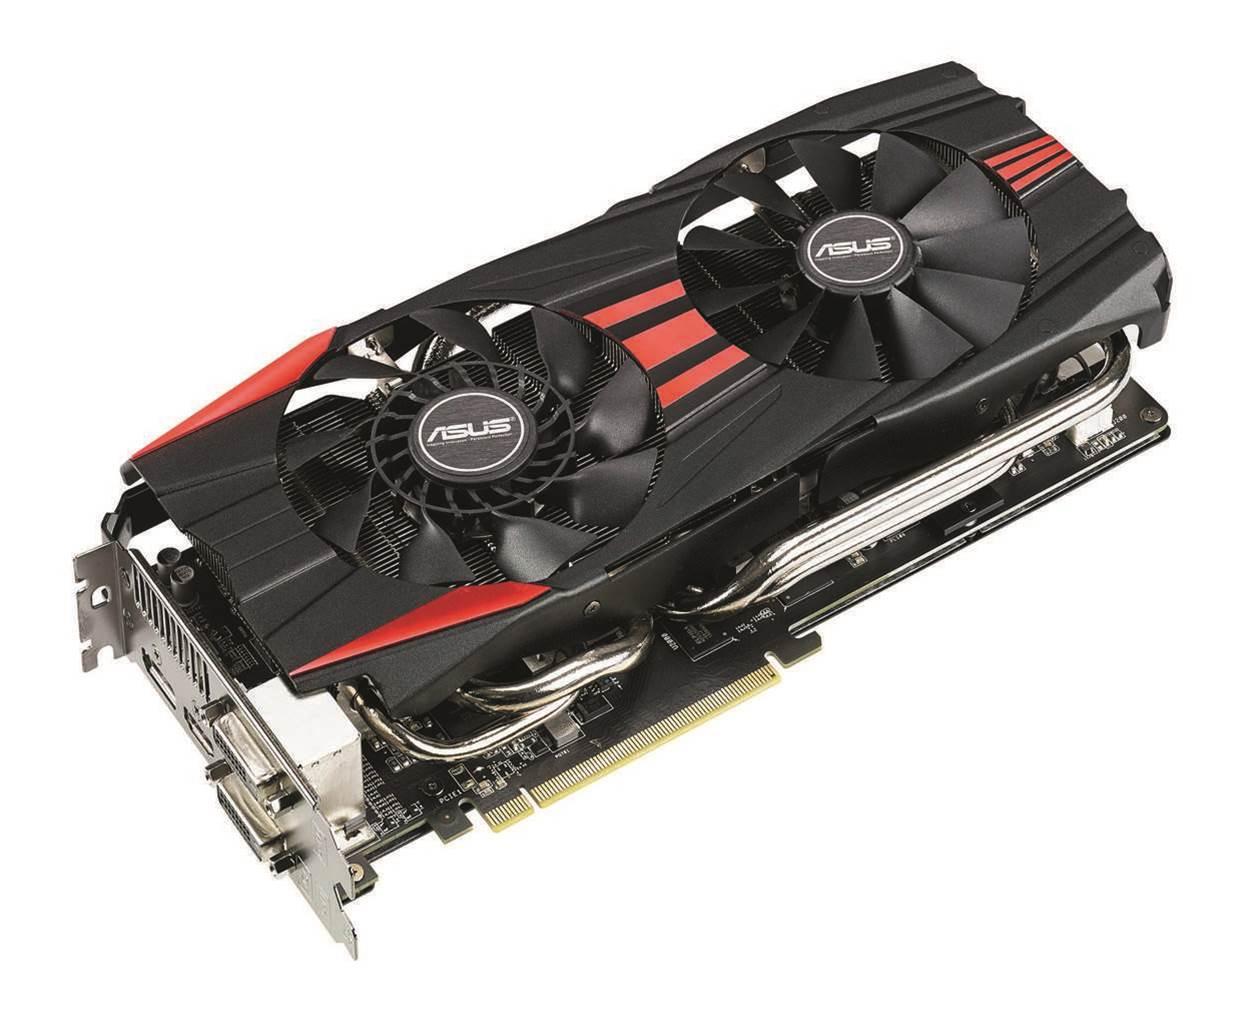 Review: ASUS Radeon R9 290 + 290x DirectCU II OC 4GB